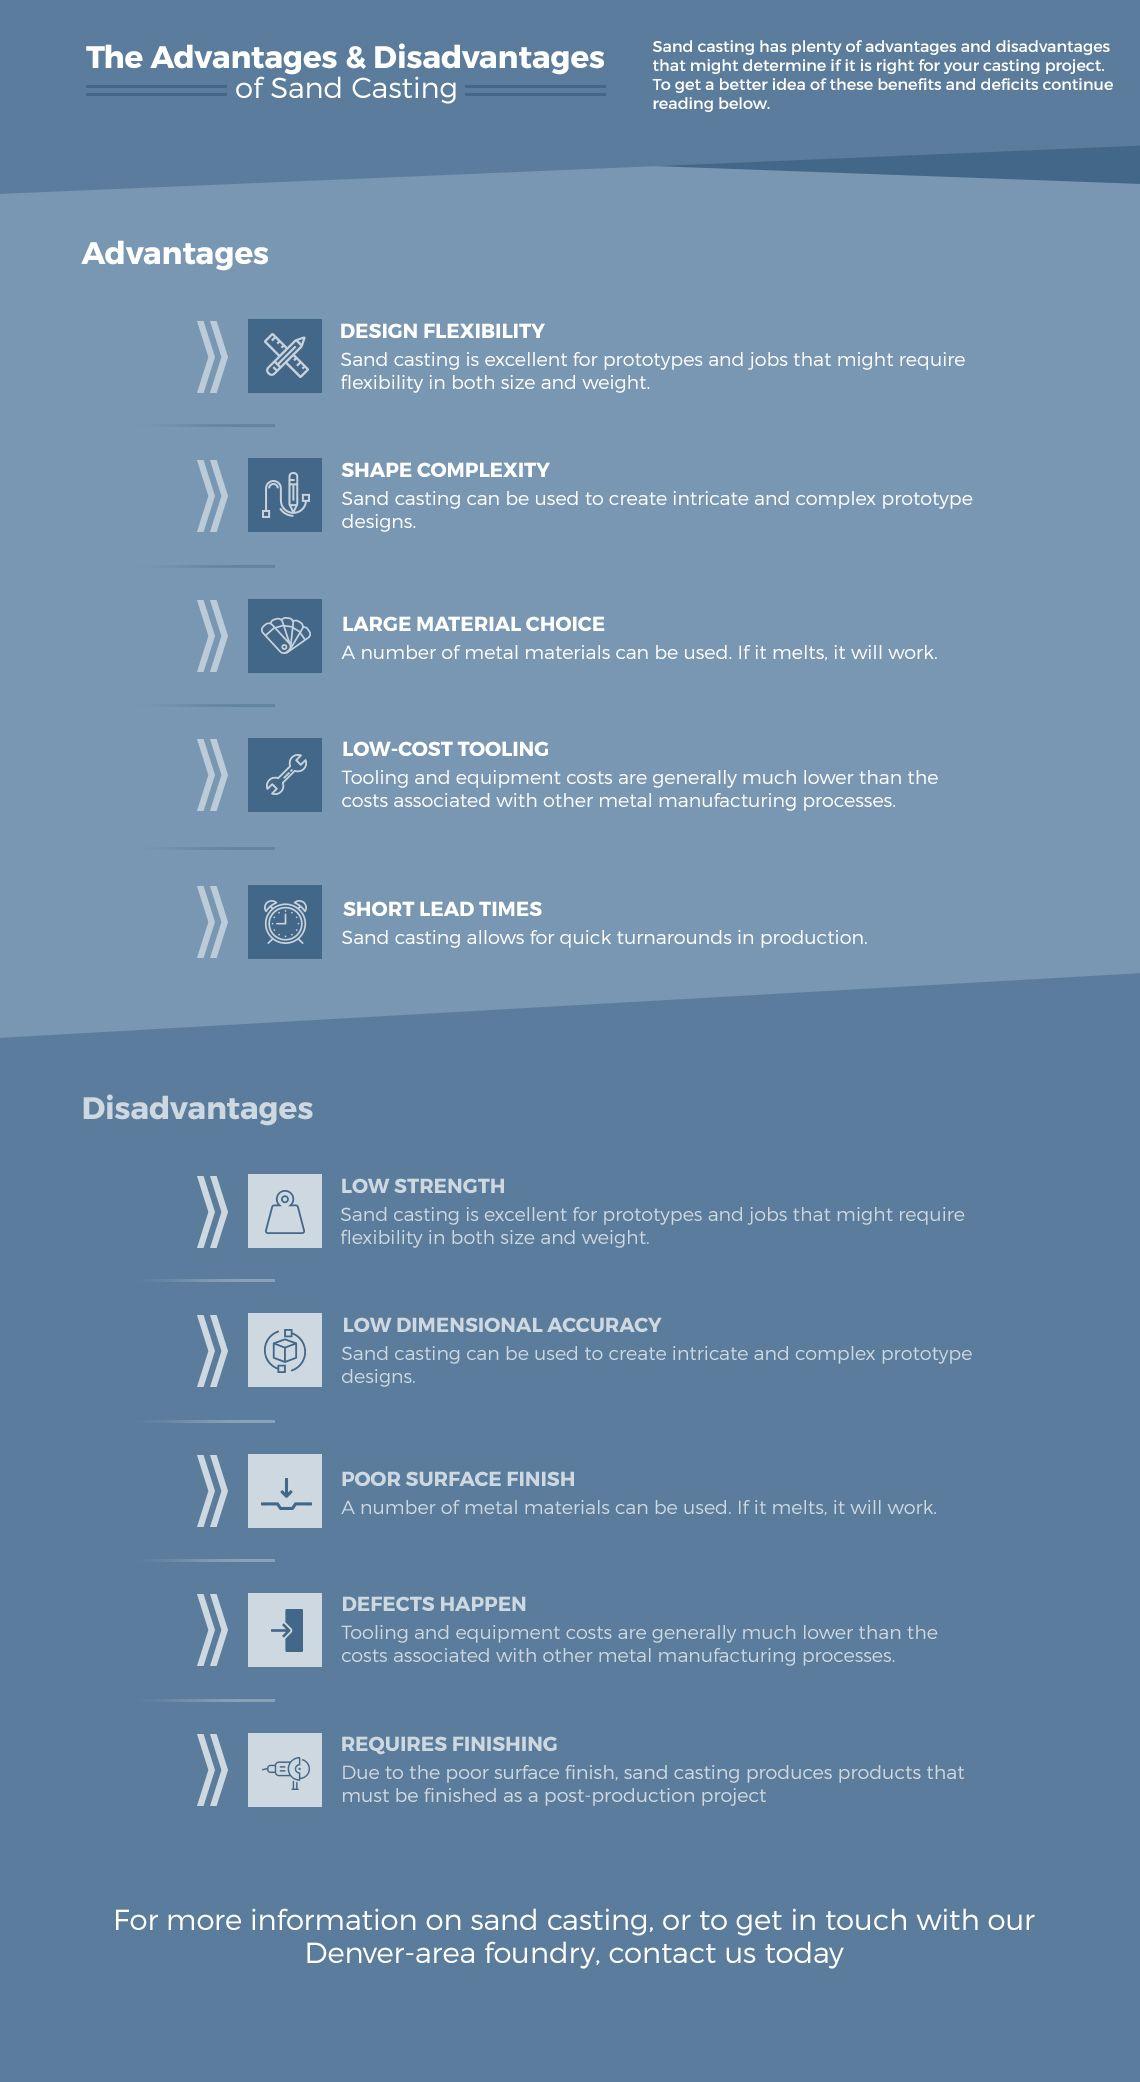 Prototype-Casting-Inc-Infographic-5c5499ed35bdc.jpg